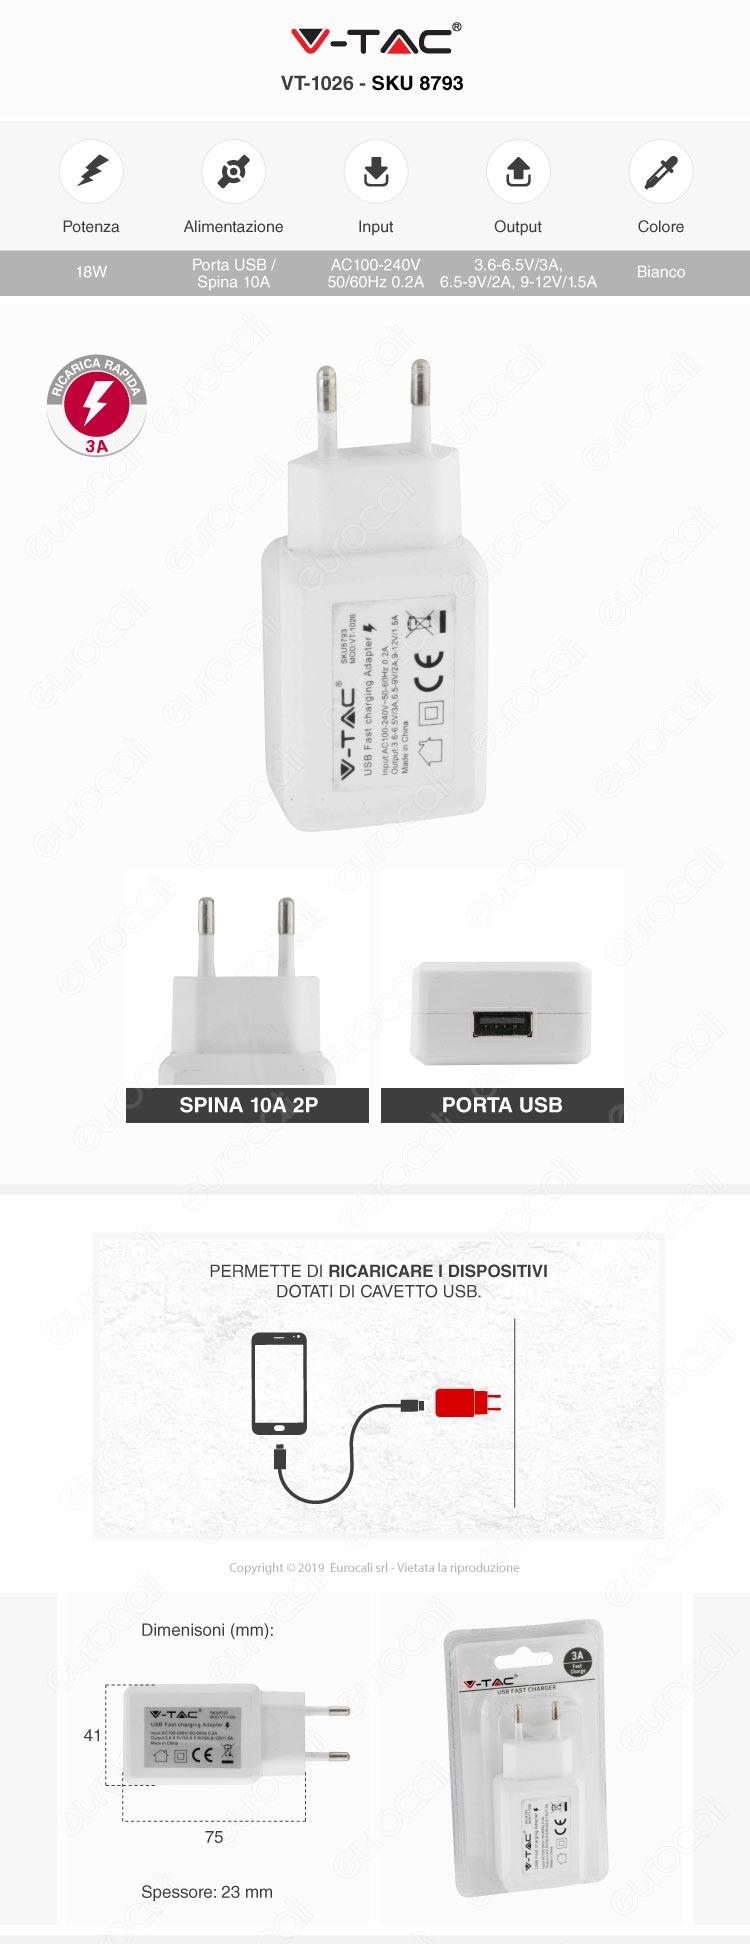 V-Tac VT-1026 Caricabatteria USB da Muro Fast Charge Colore Bianco